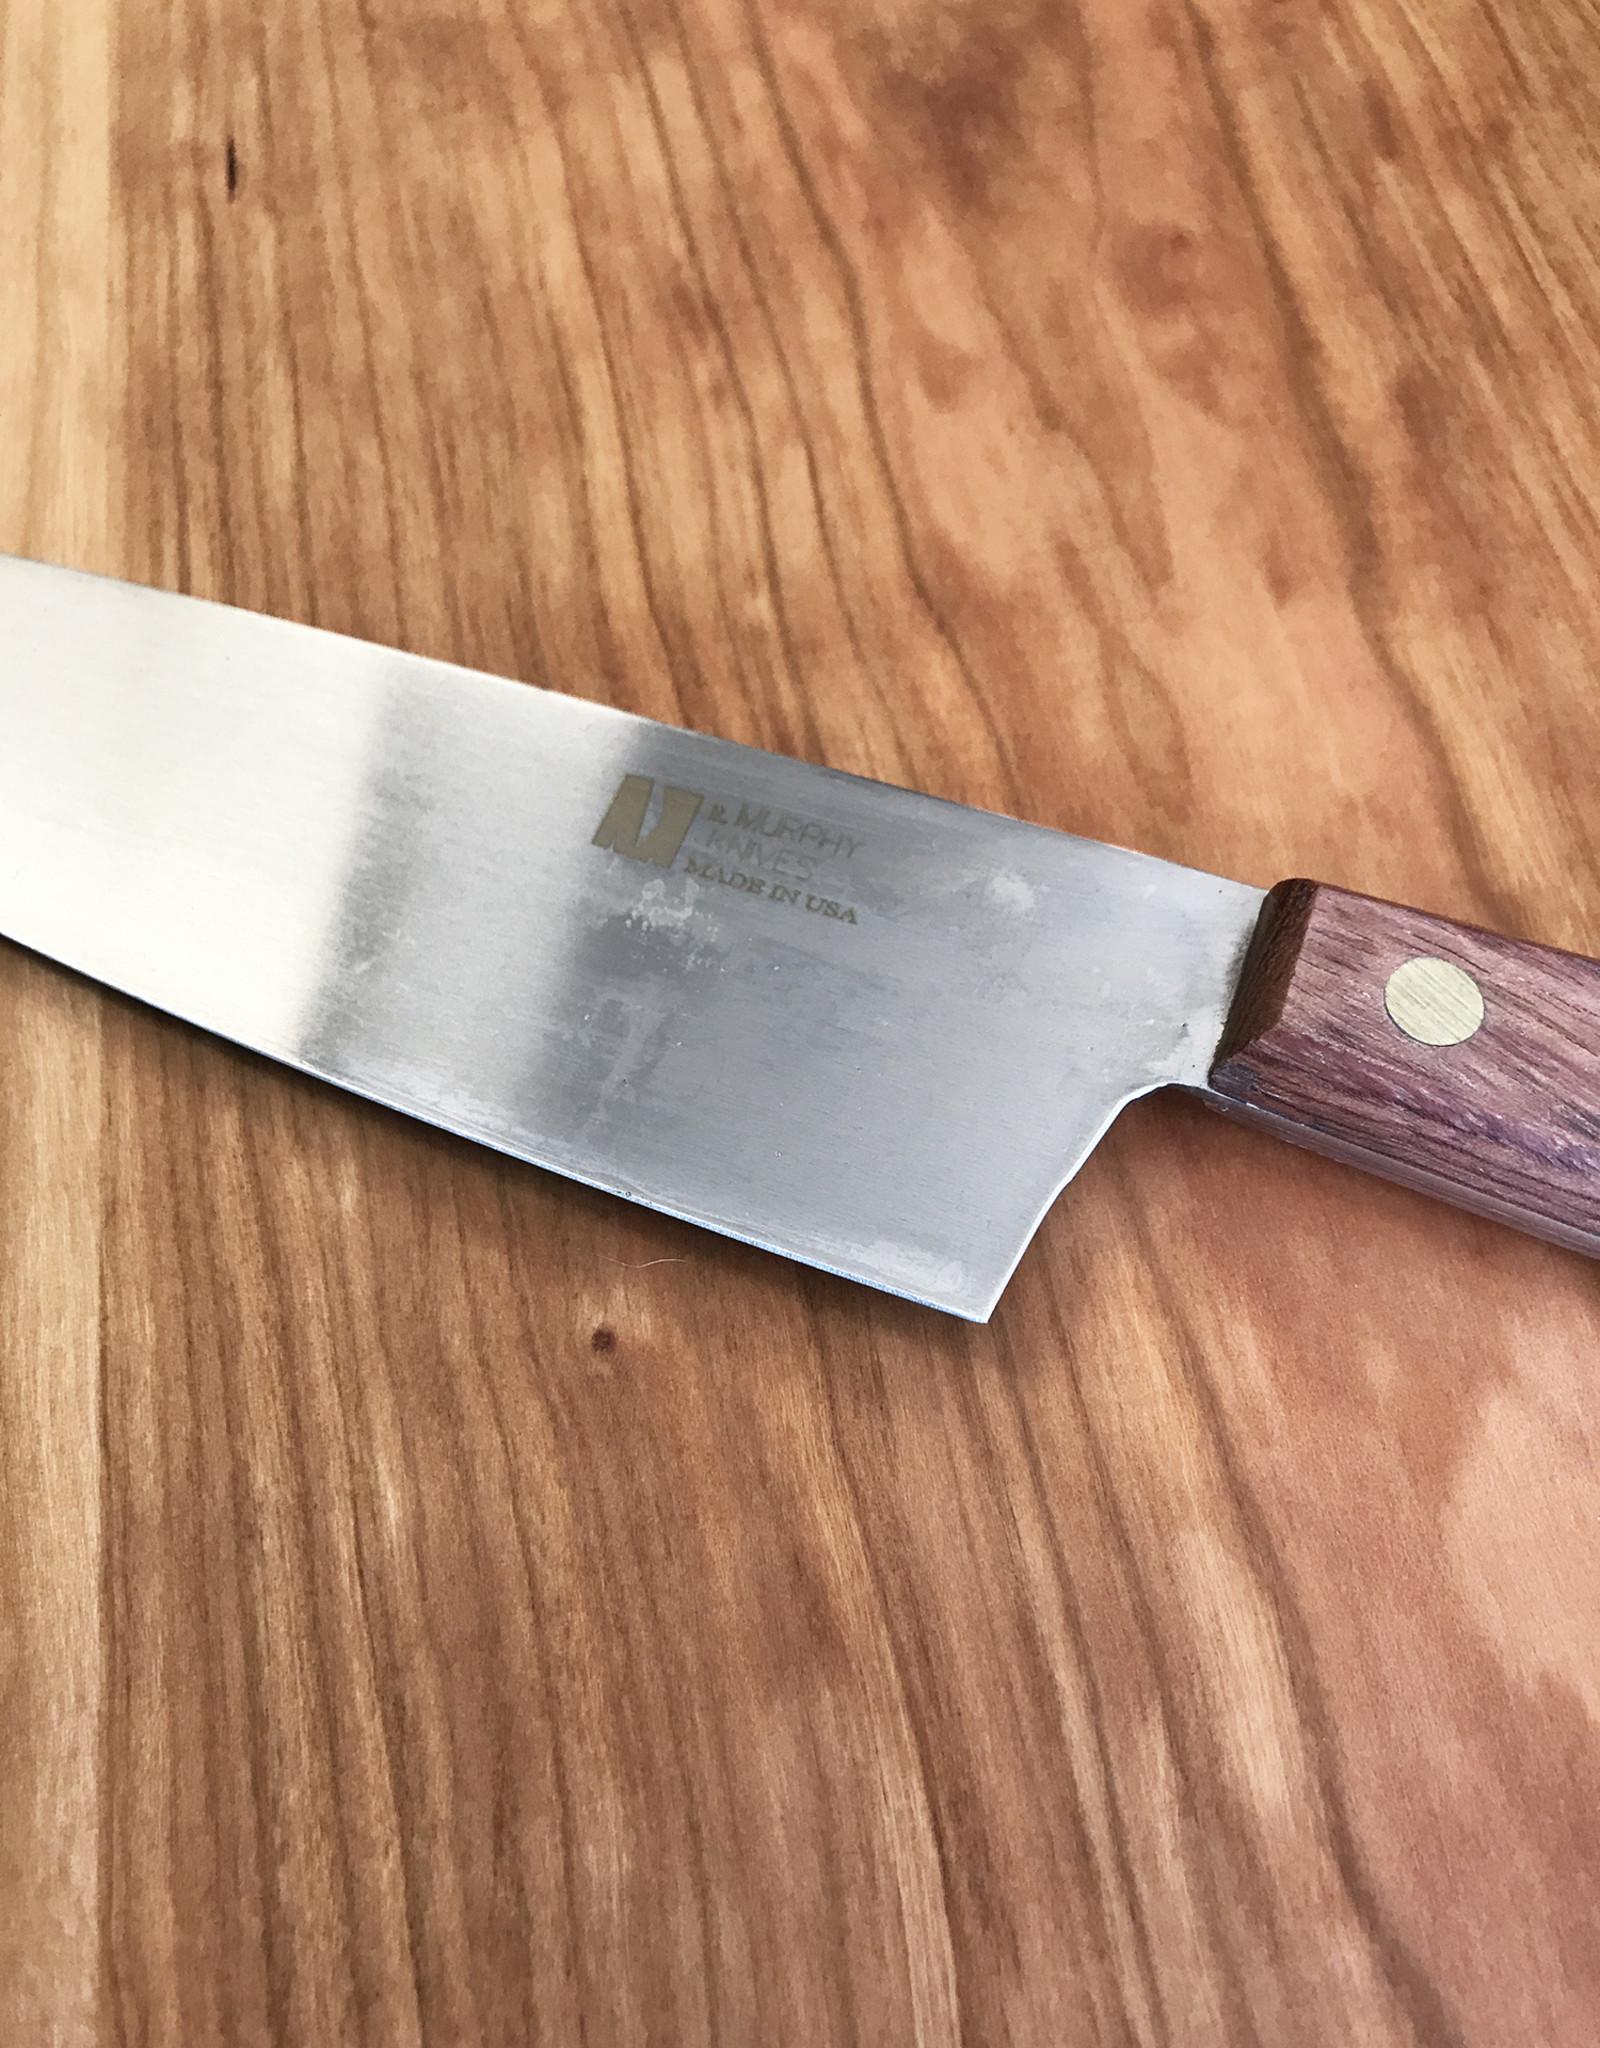 R. Murphy R. Murphy Carbon Chef Knife